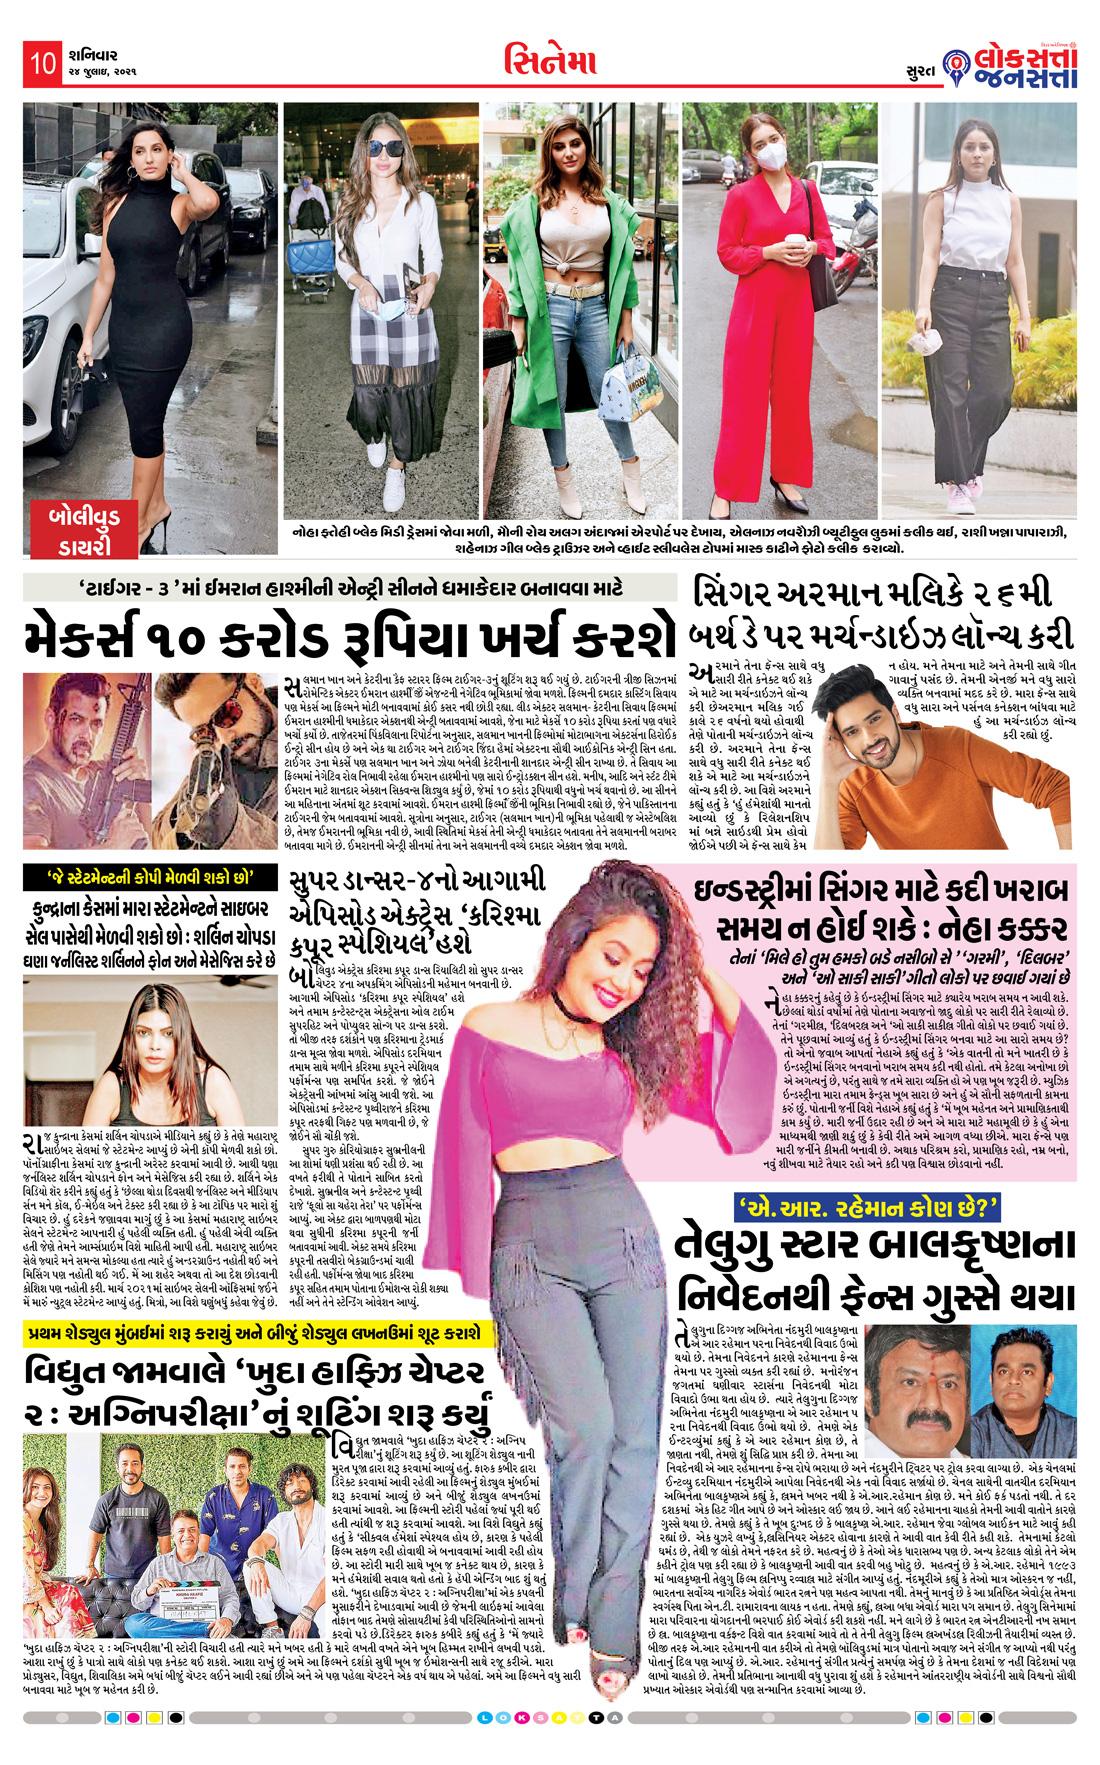 Loksatta Jansatta News Papaer E-paper dated 2021-07-24 | Page 10